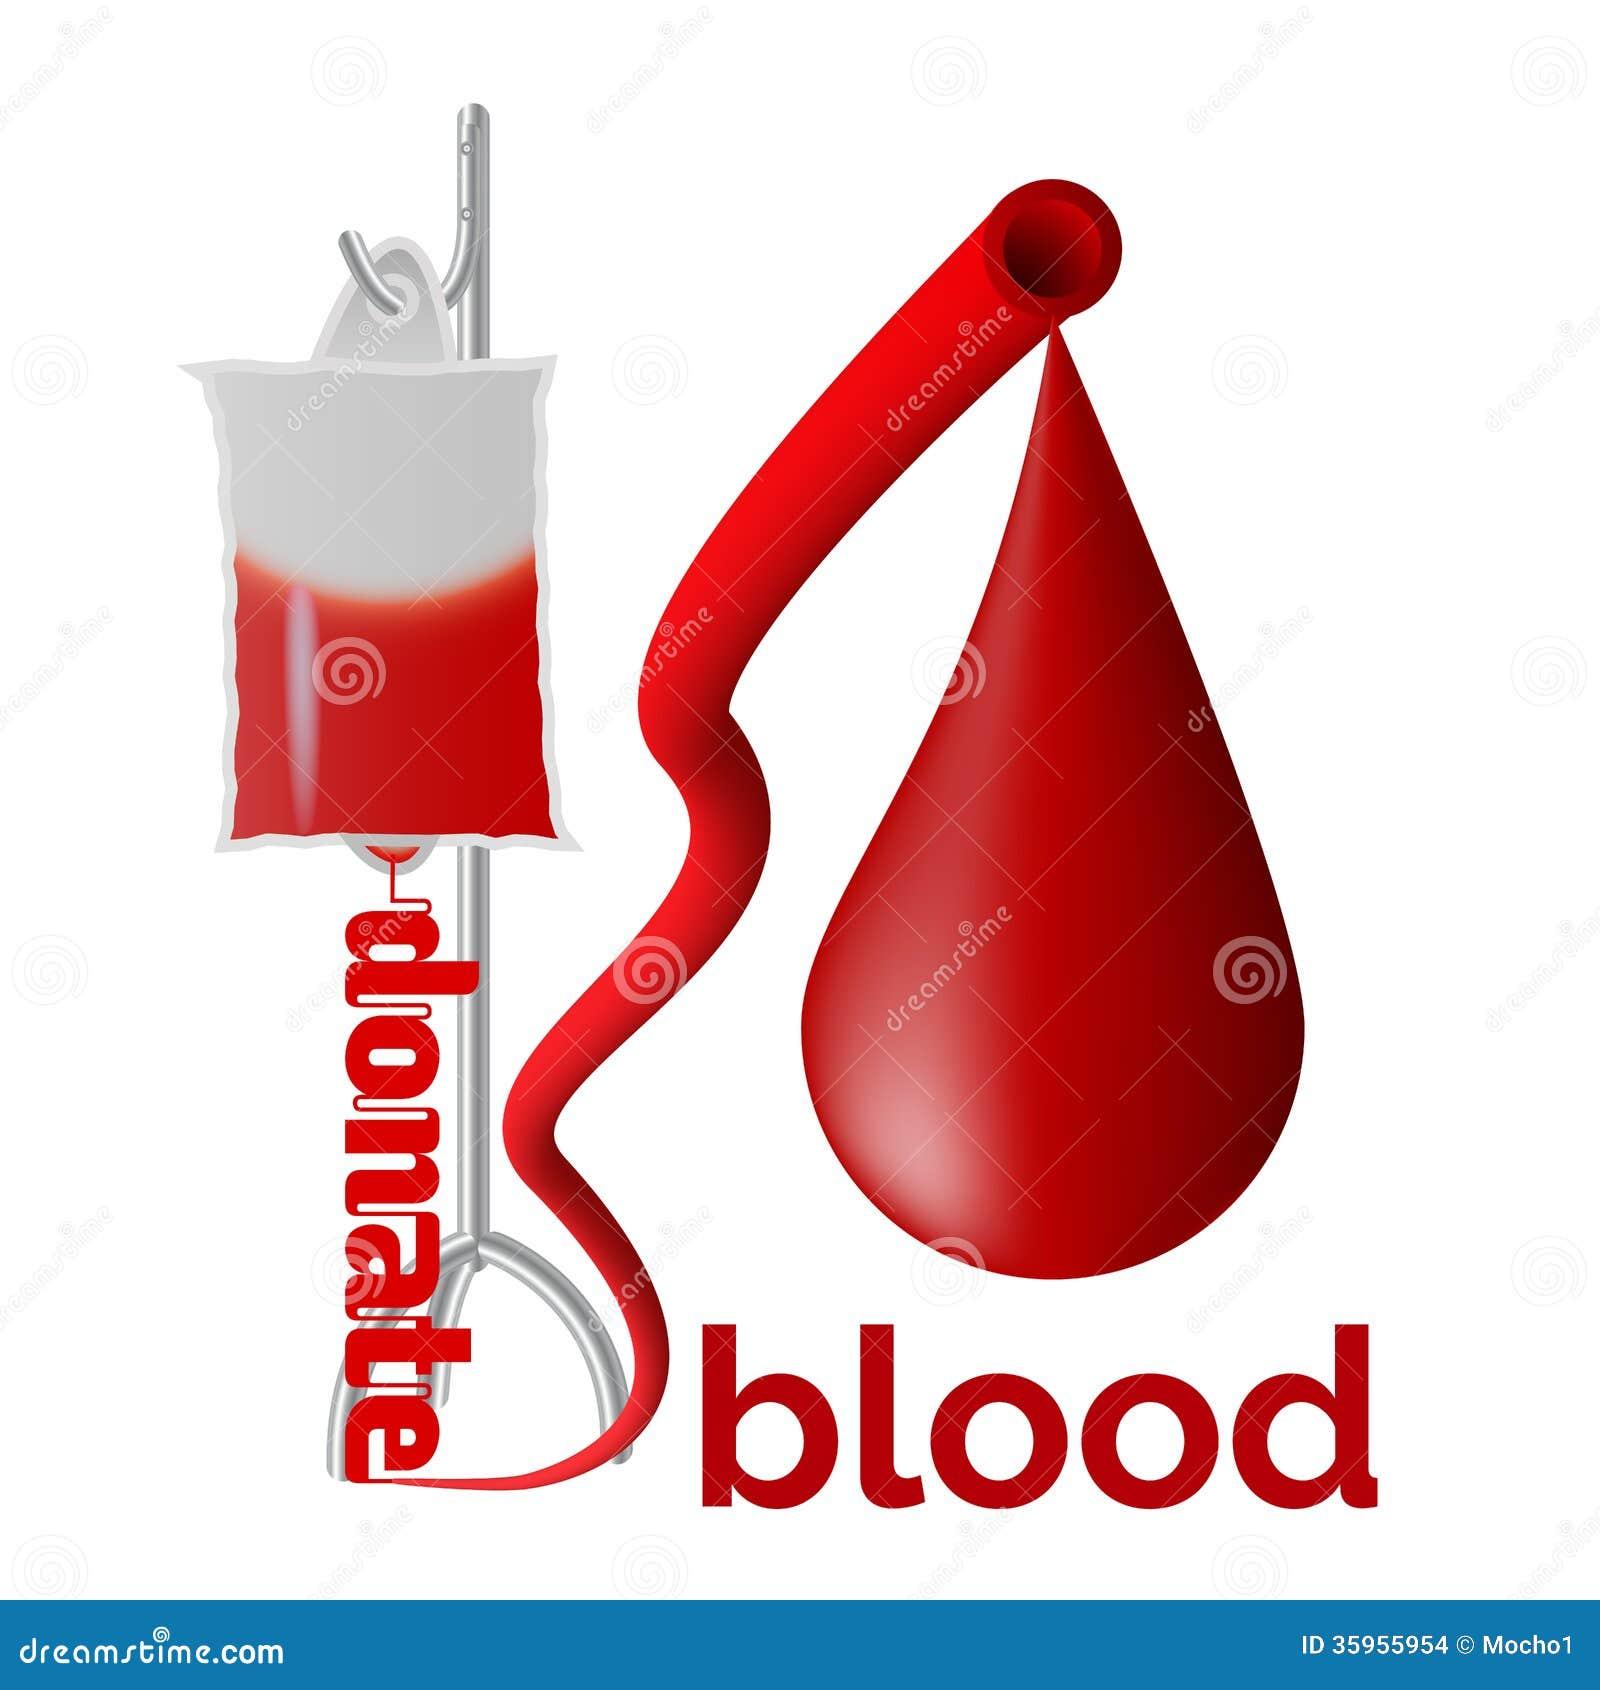 Donate blood stock illustration illustration of design 35955954 for Blood bank planning and designing